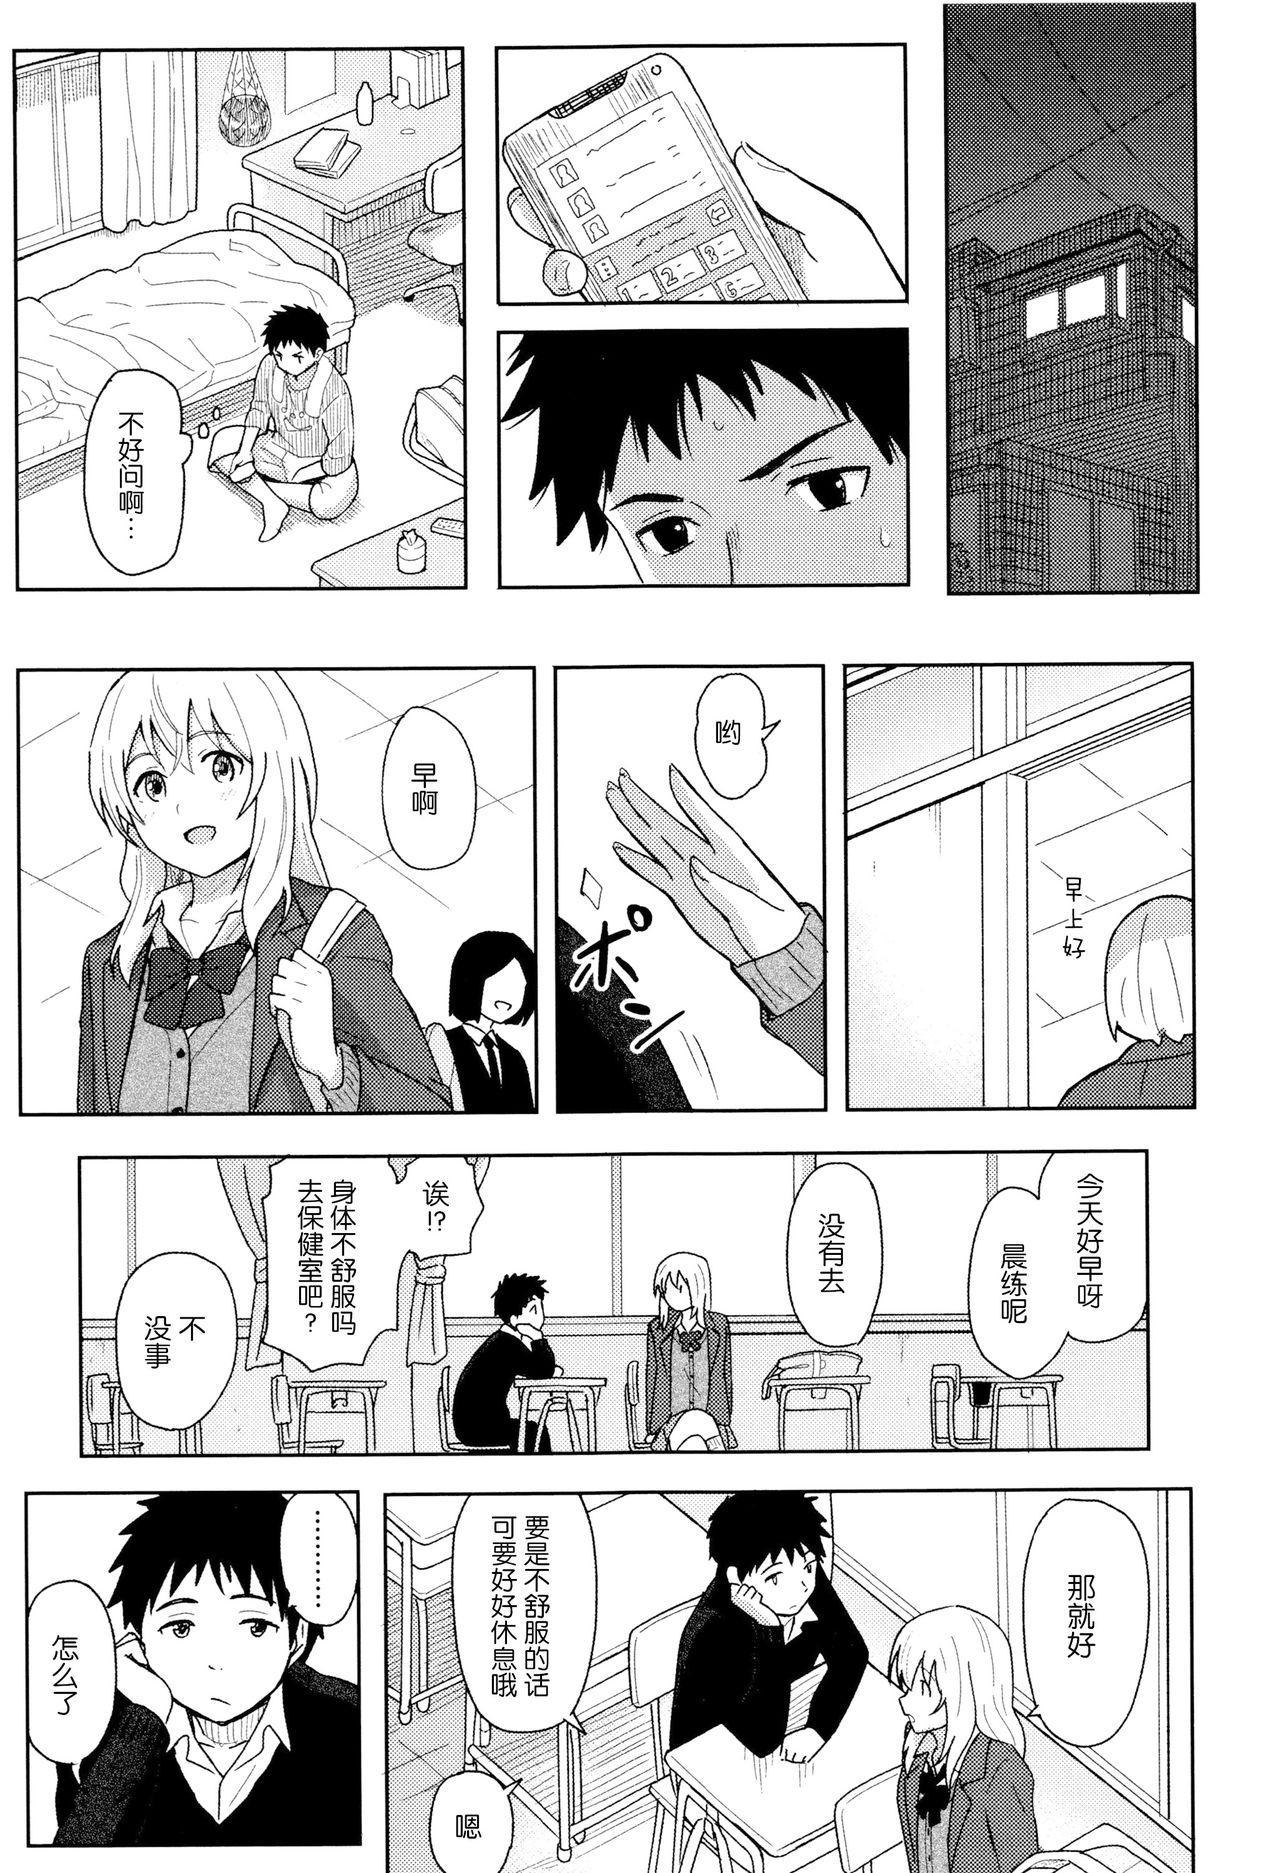 Tokubetsu na Mainichi - Special daily 9